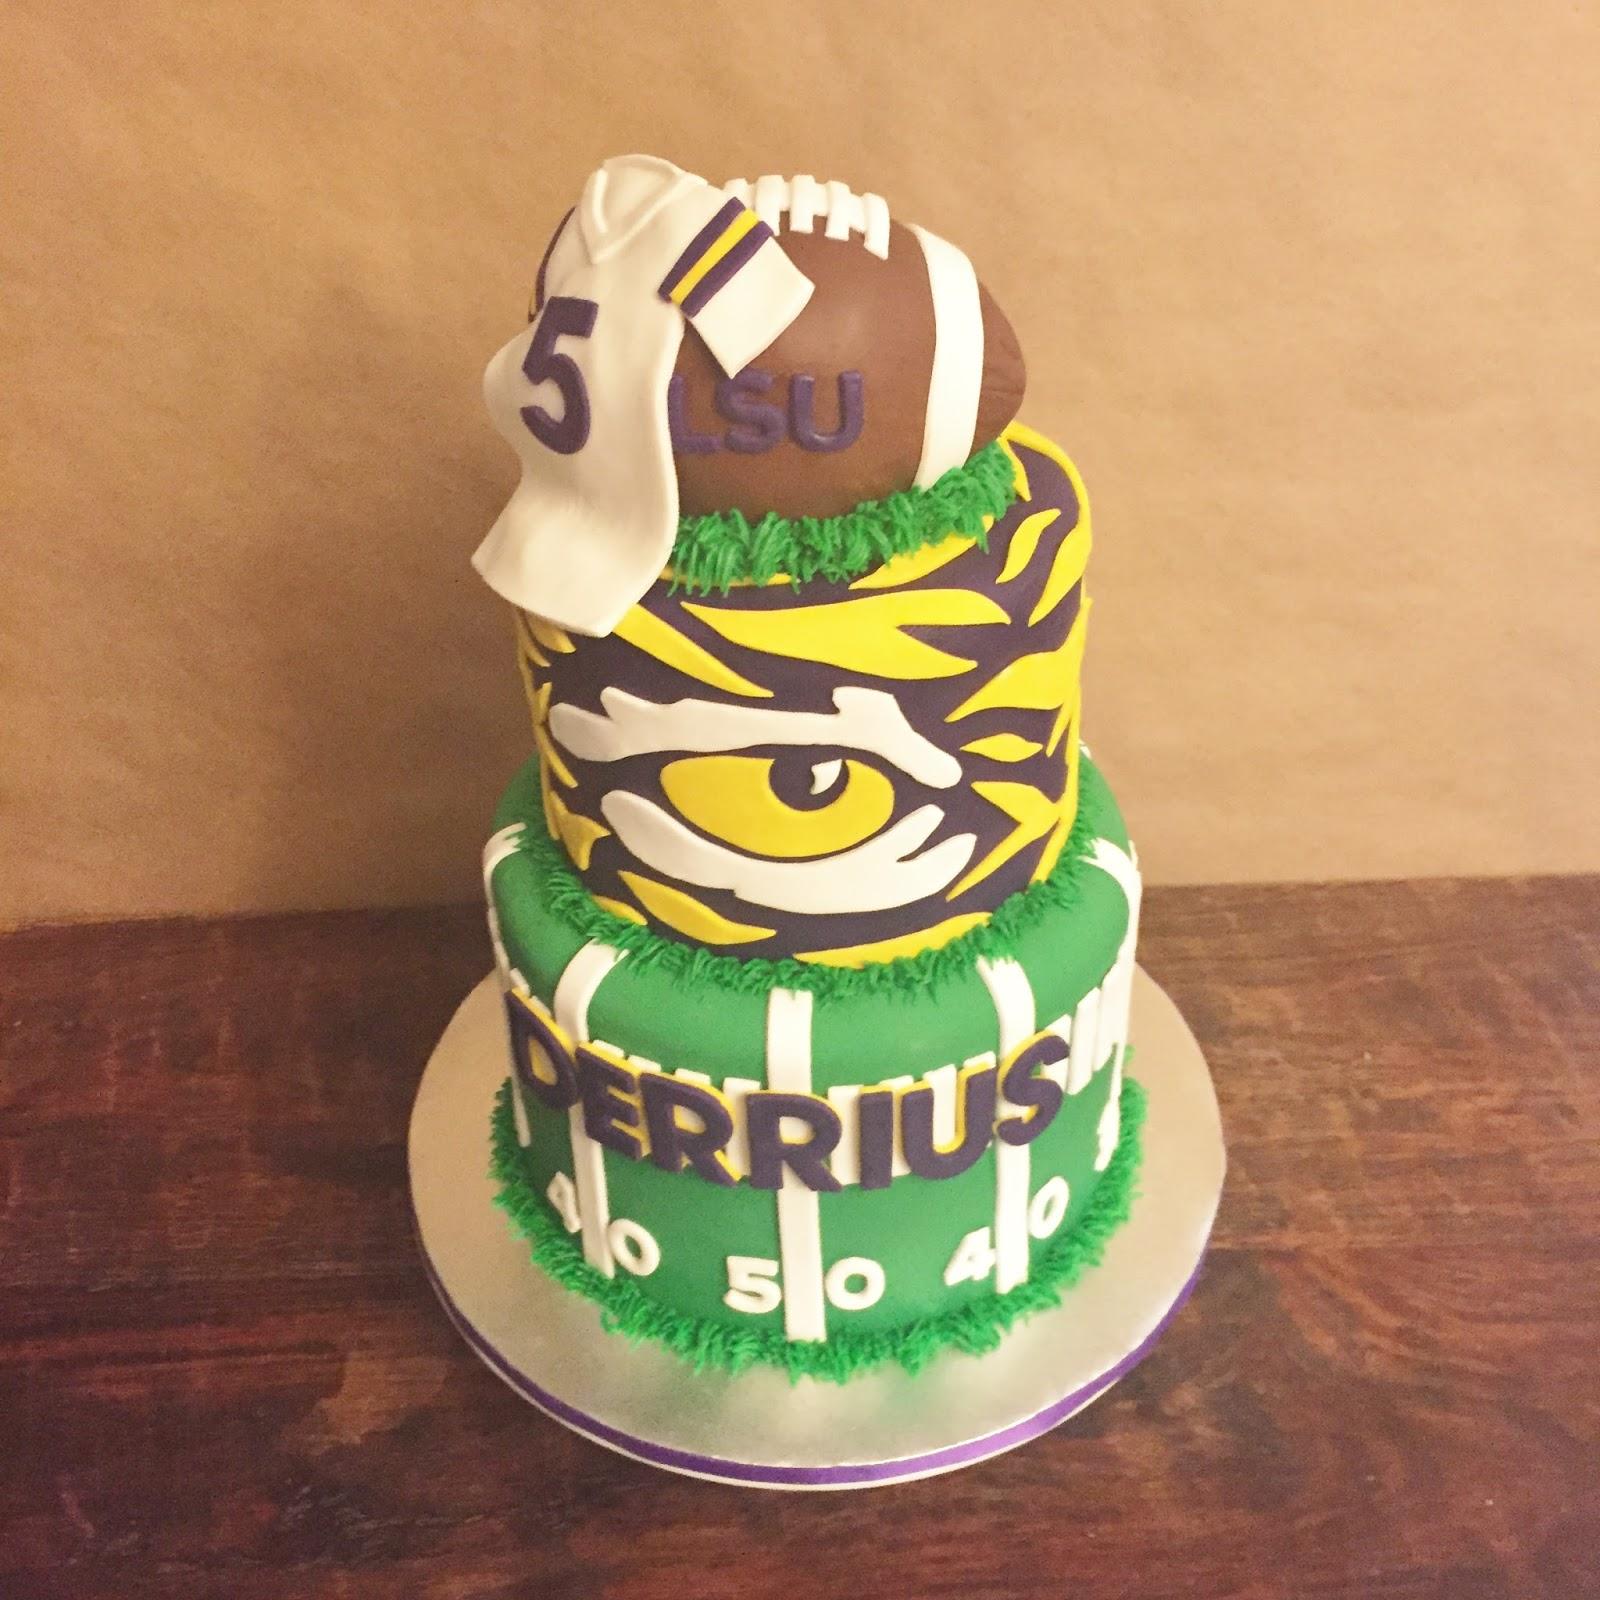 Wondrous Cakes By Mindy Lsu Tigers Football Cake 6 8 Personalised Birthday Cards Veneteletsinfo